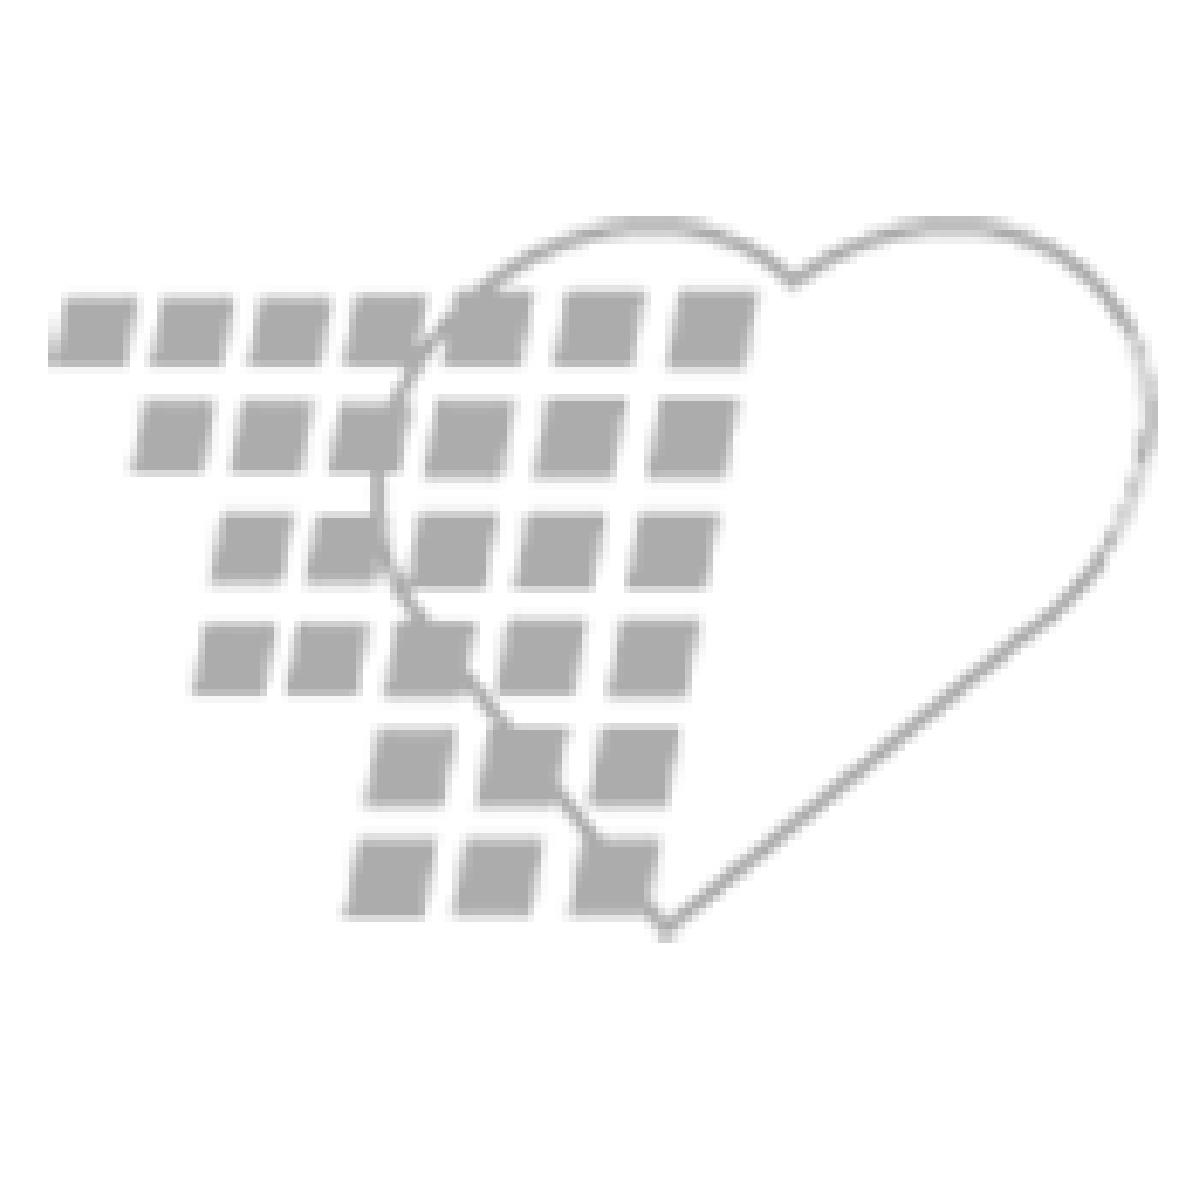 07-71-1020 Chemetron Analog Suction Regulator Cont/Int. Diss/Pat